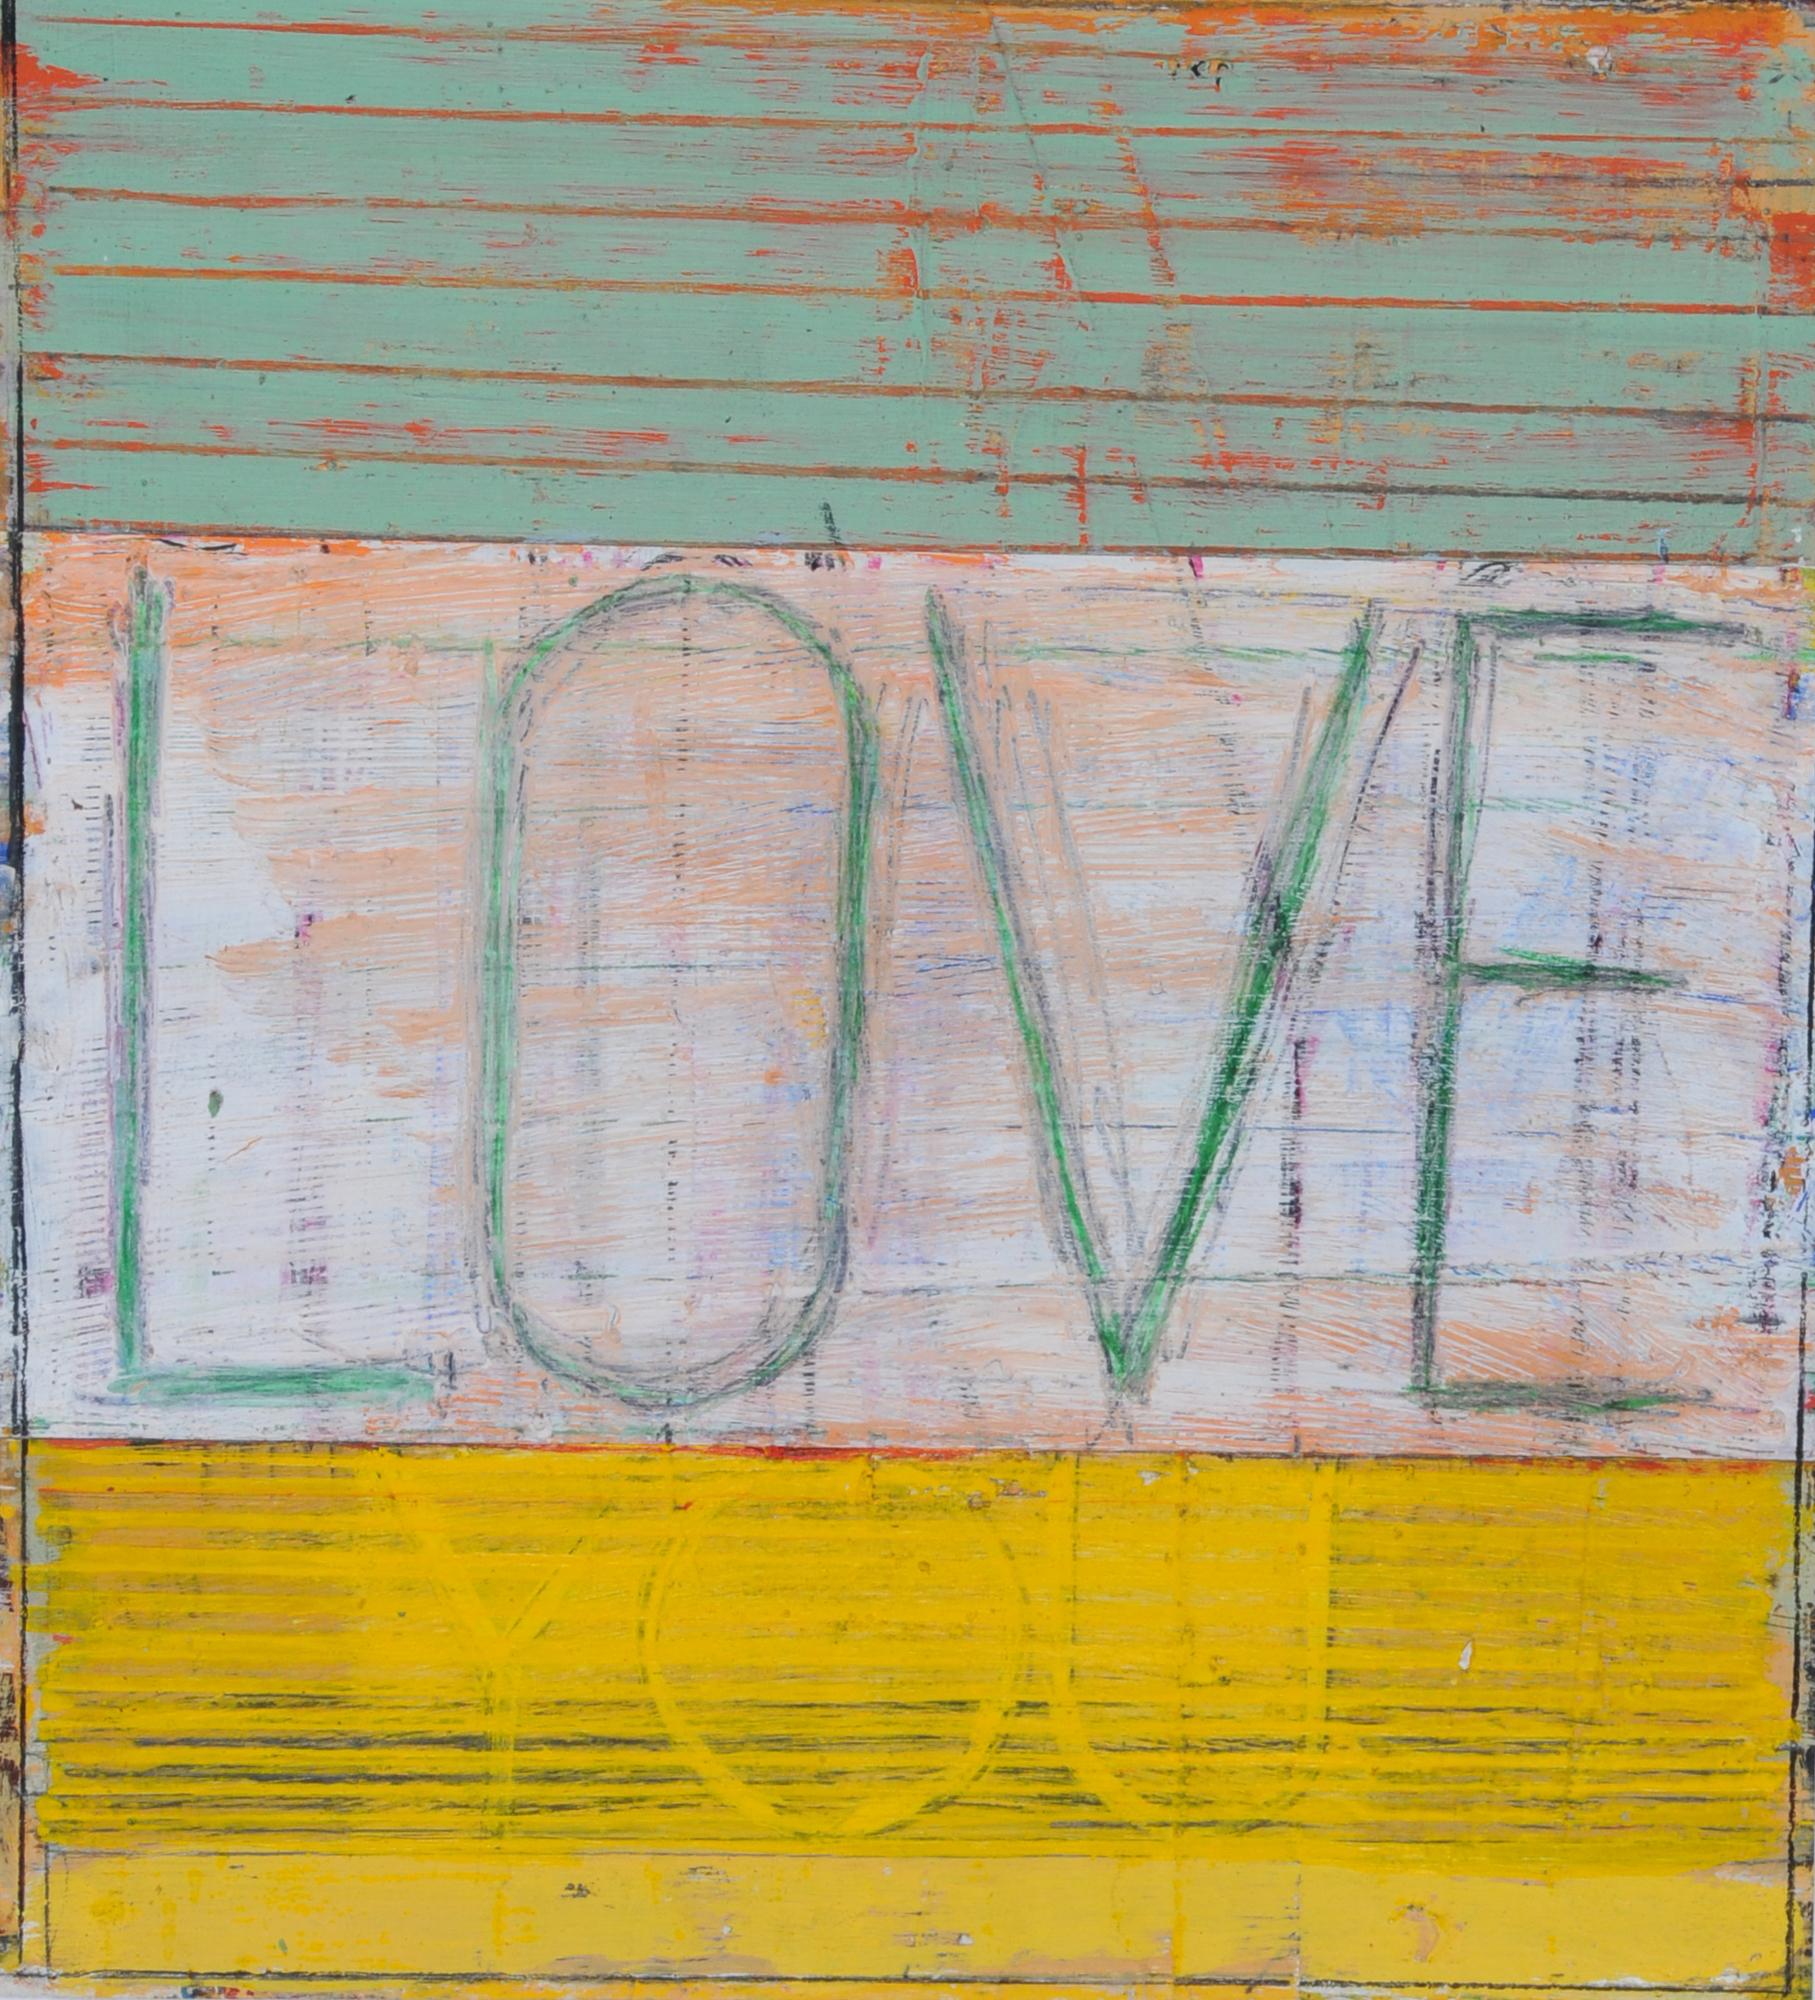 Spiller David, Love